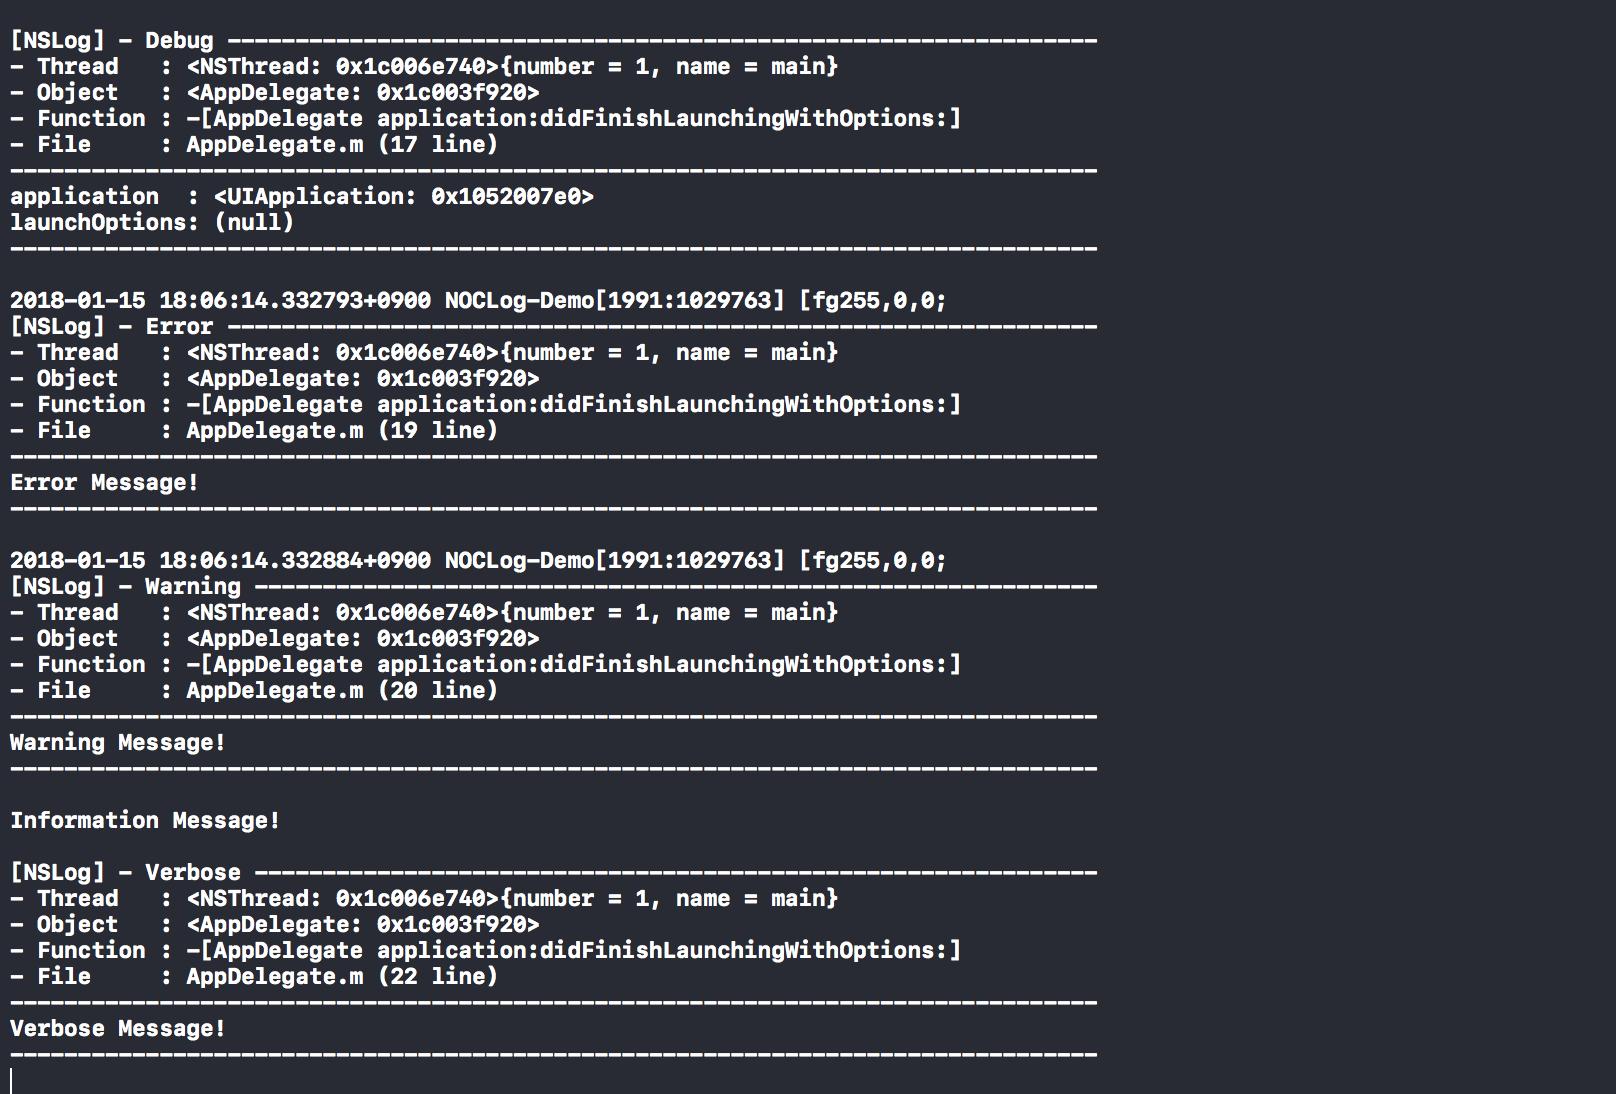 Sample log output